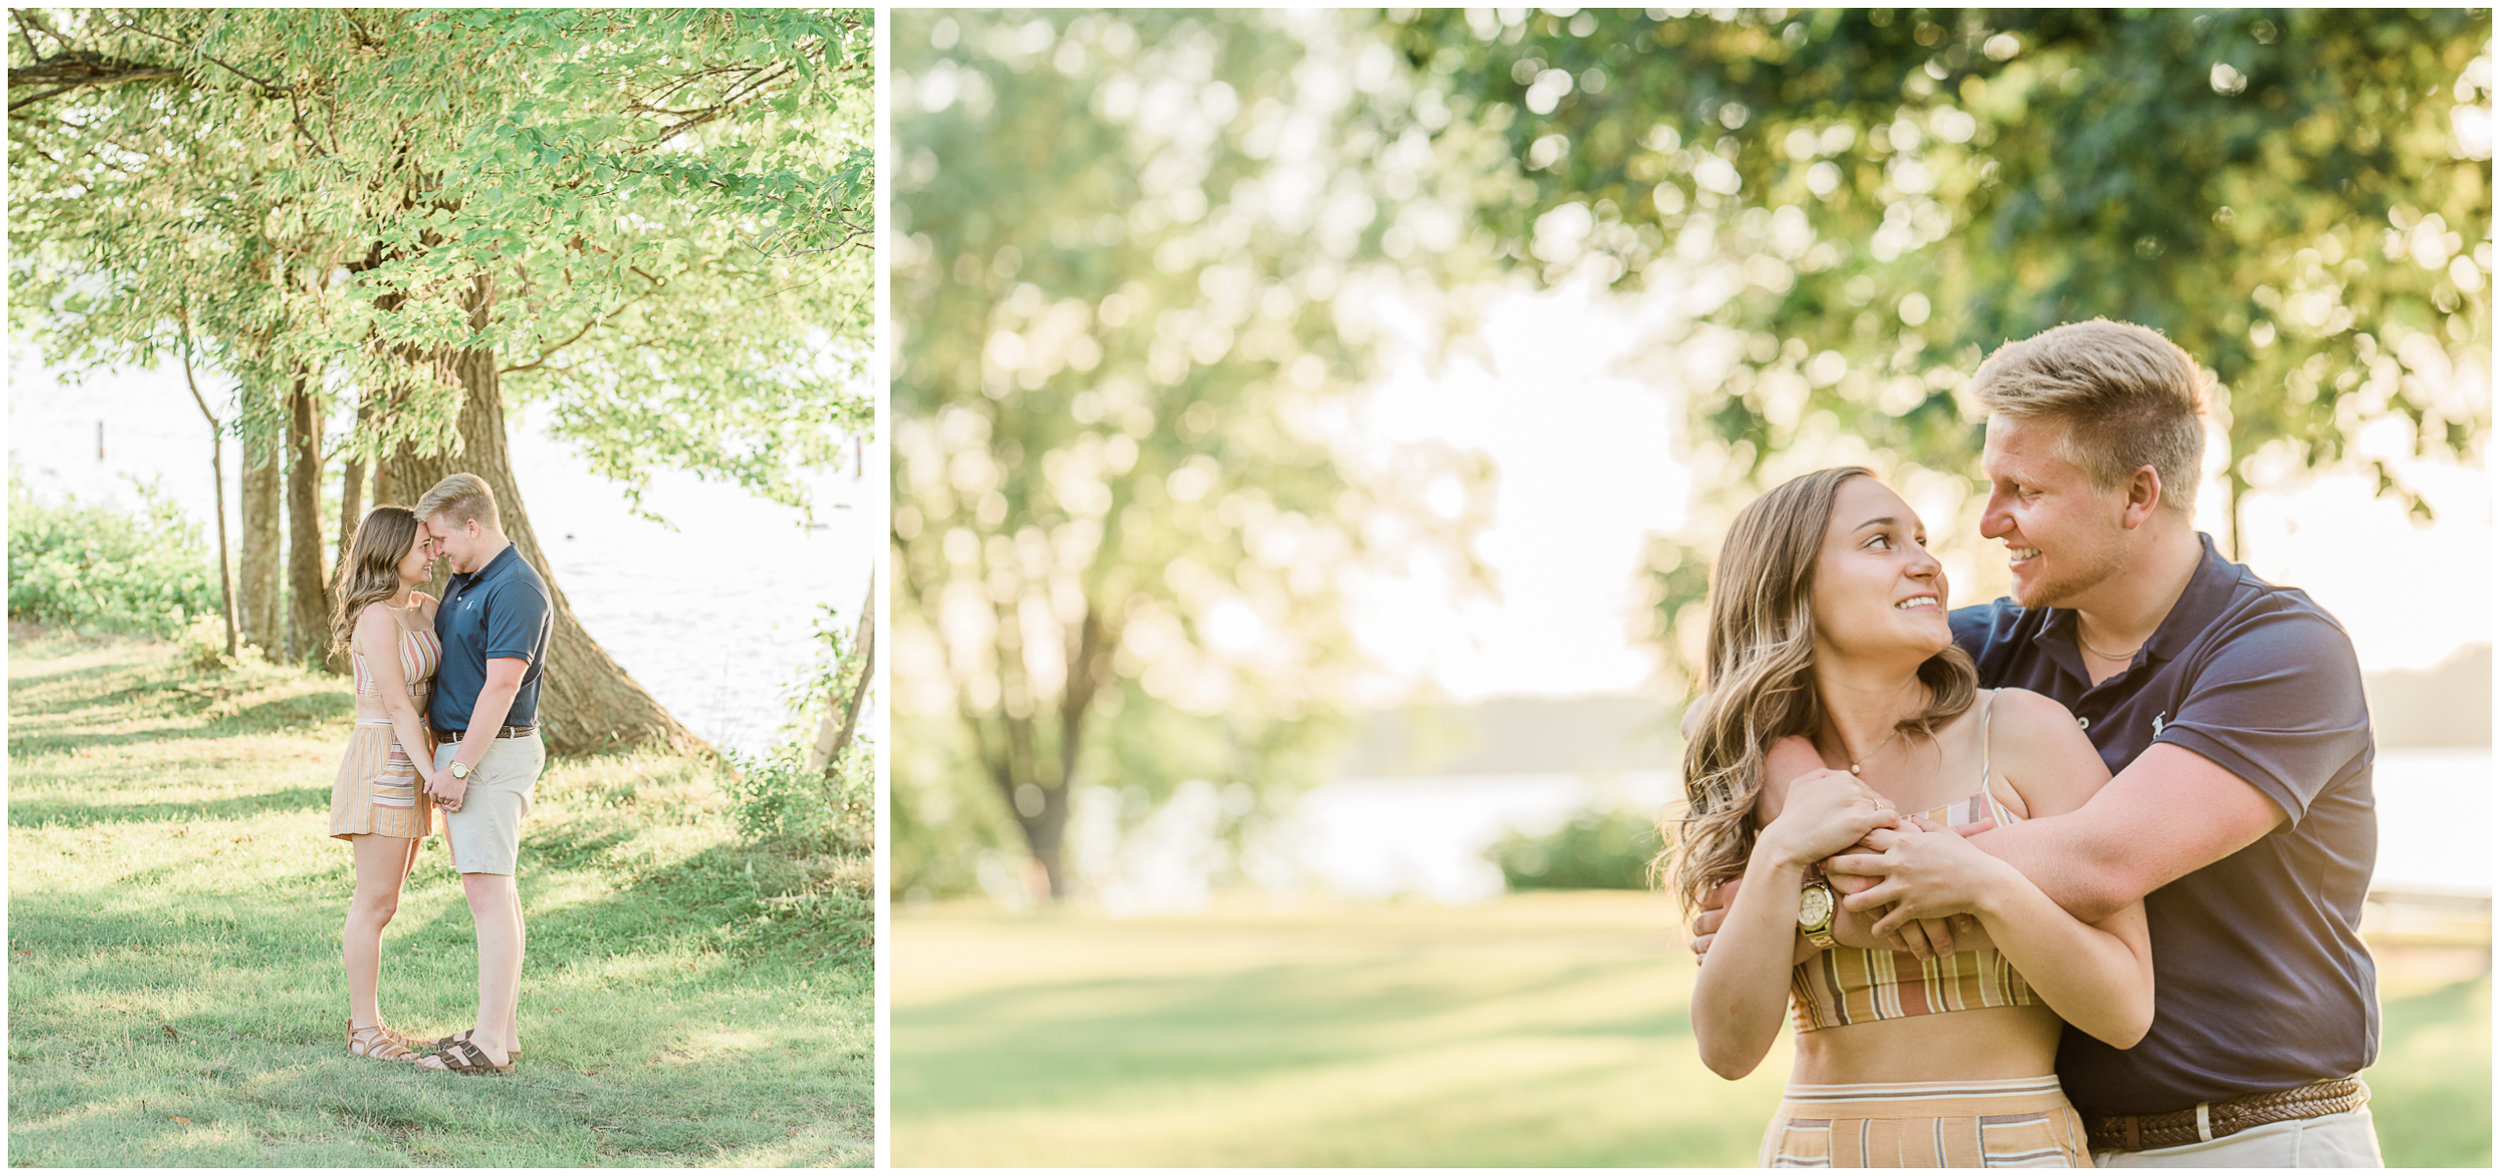 rhinelander-wisconsin-wedding-photographer-minocqua-photography-family-senior-eagle-river-wi5.jpg